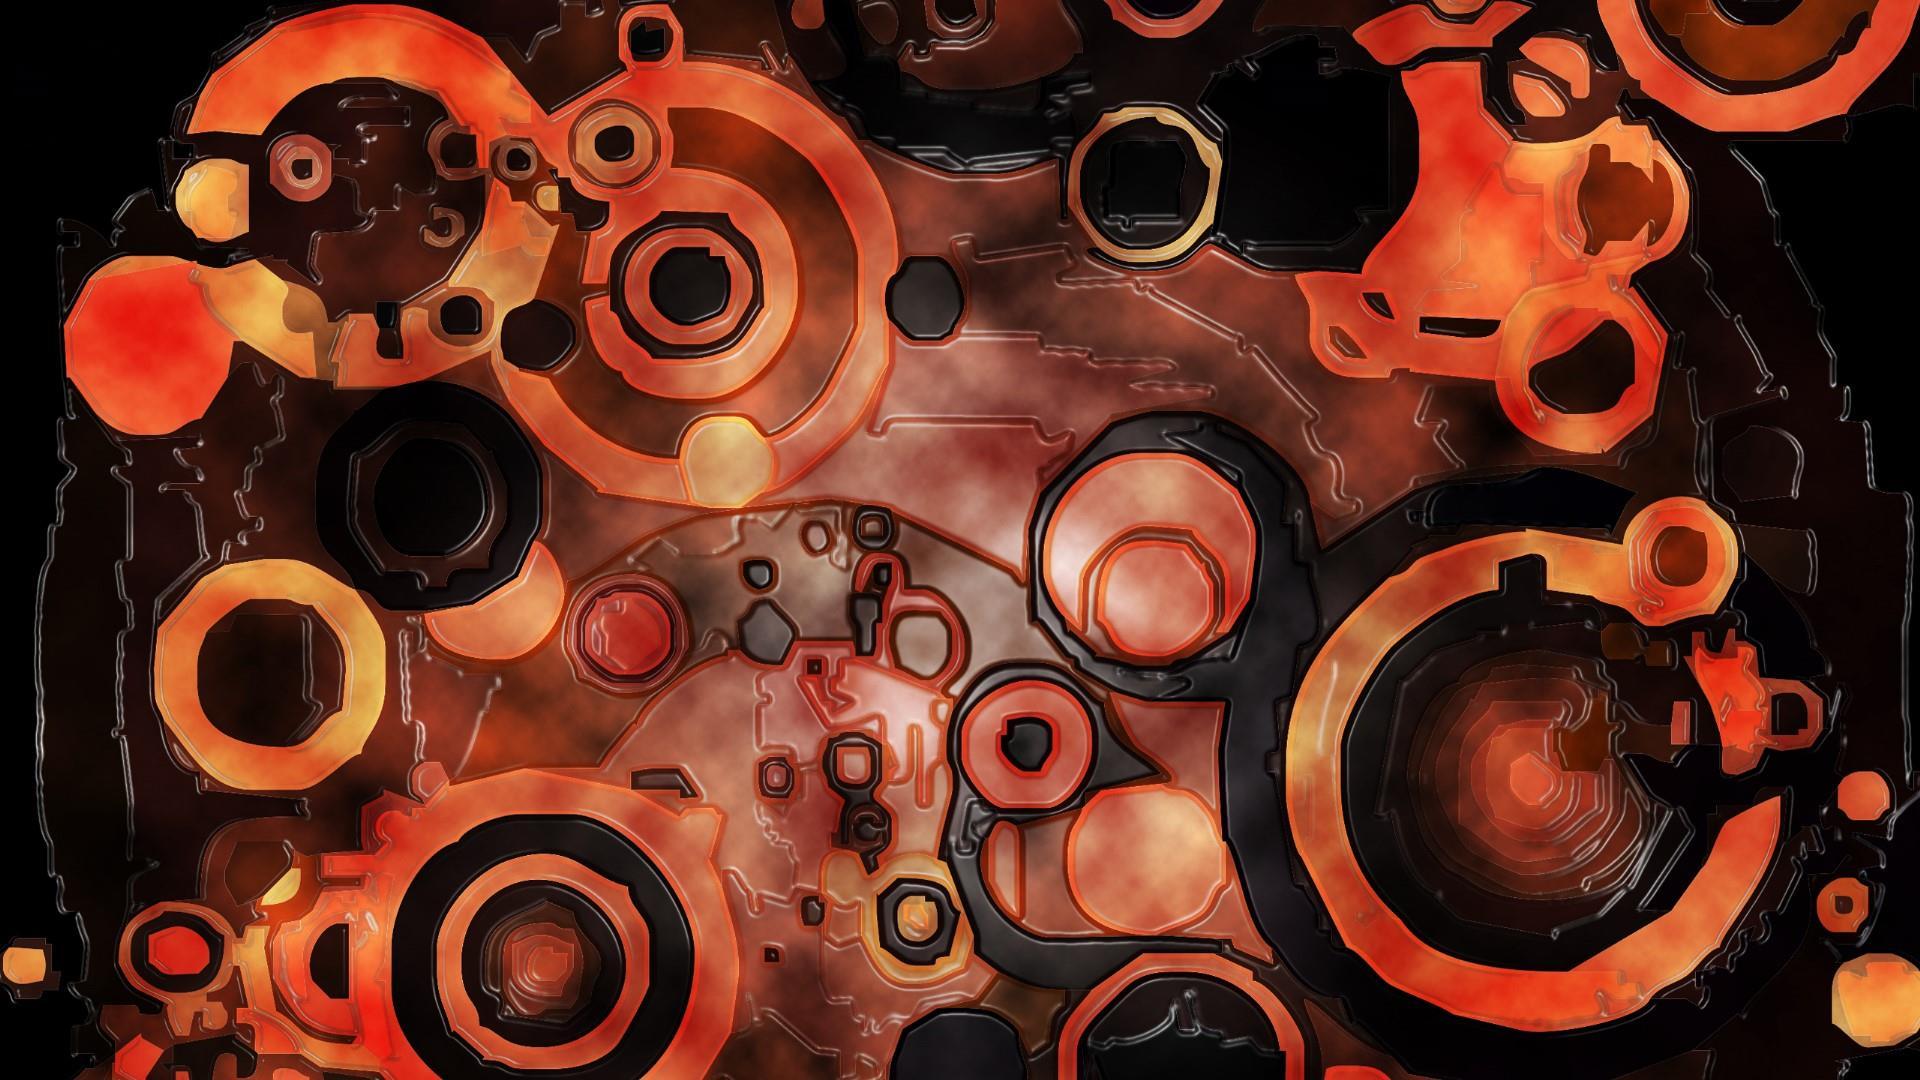 Orange & Black Spots wallpaper